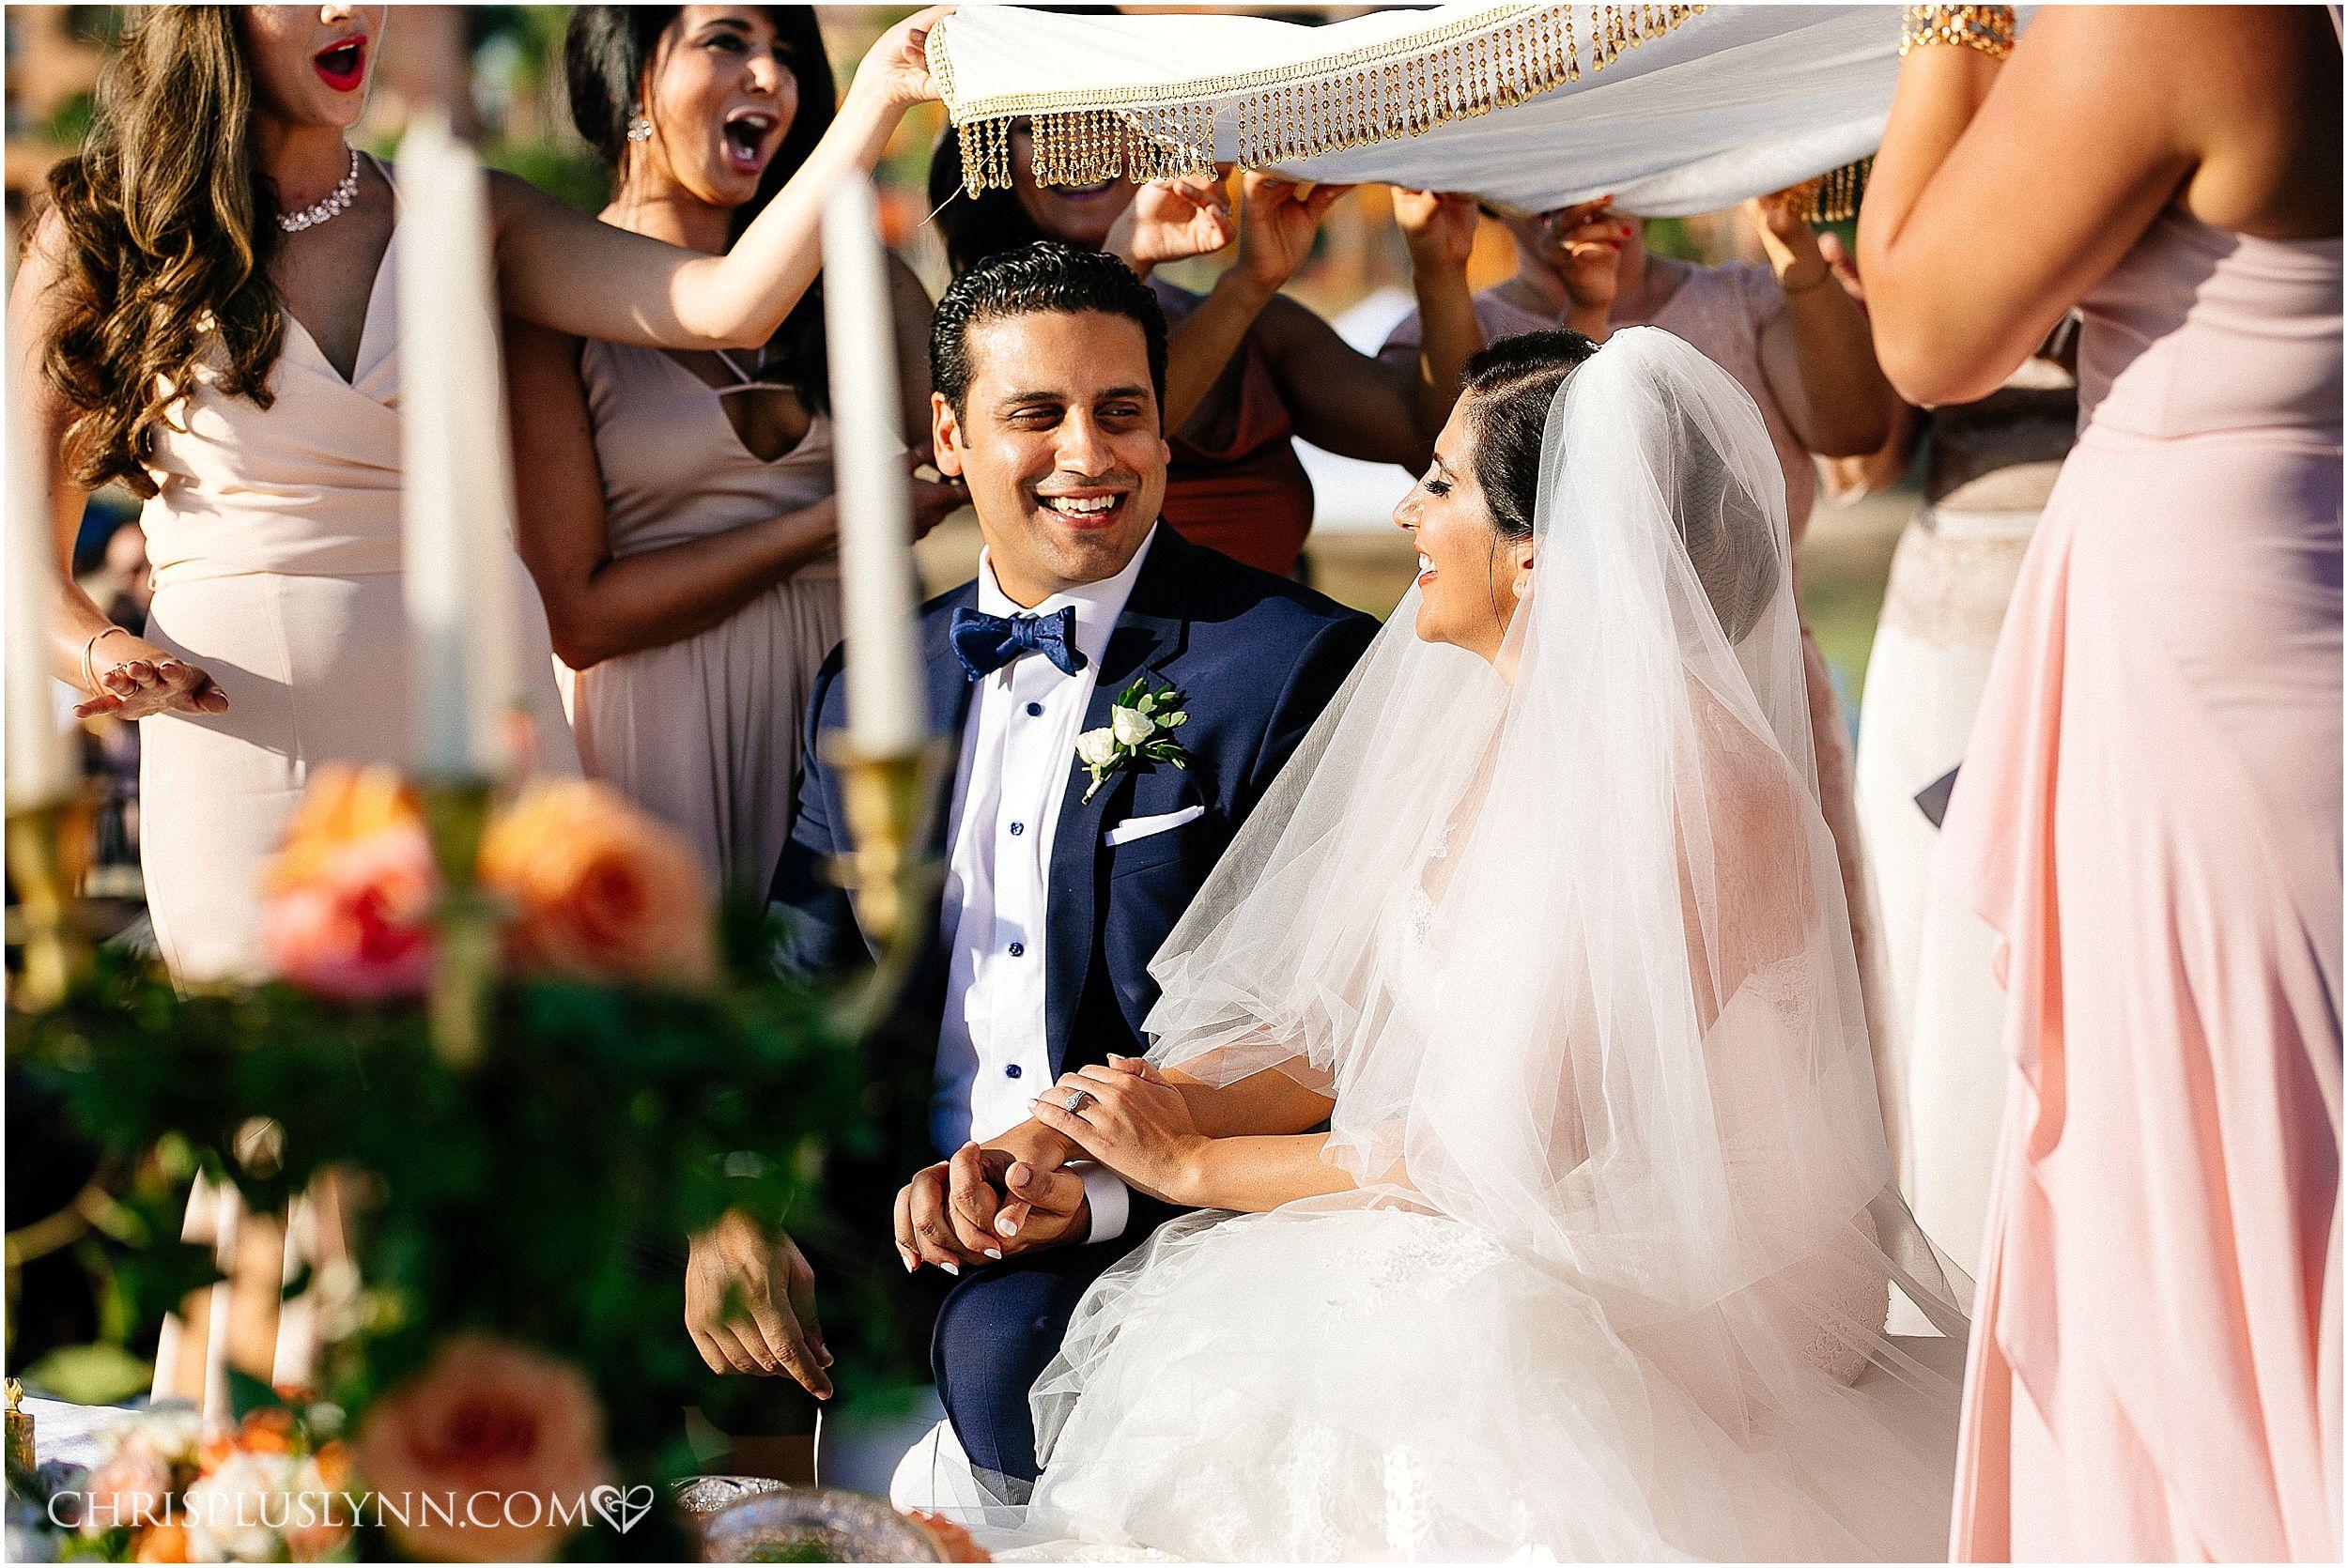 Cabo del Sol Wedding | Bride and Groom laugh during ceremony